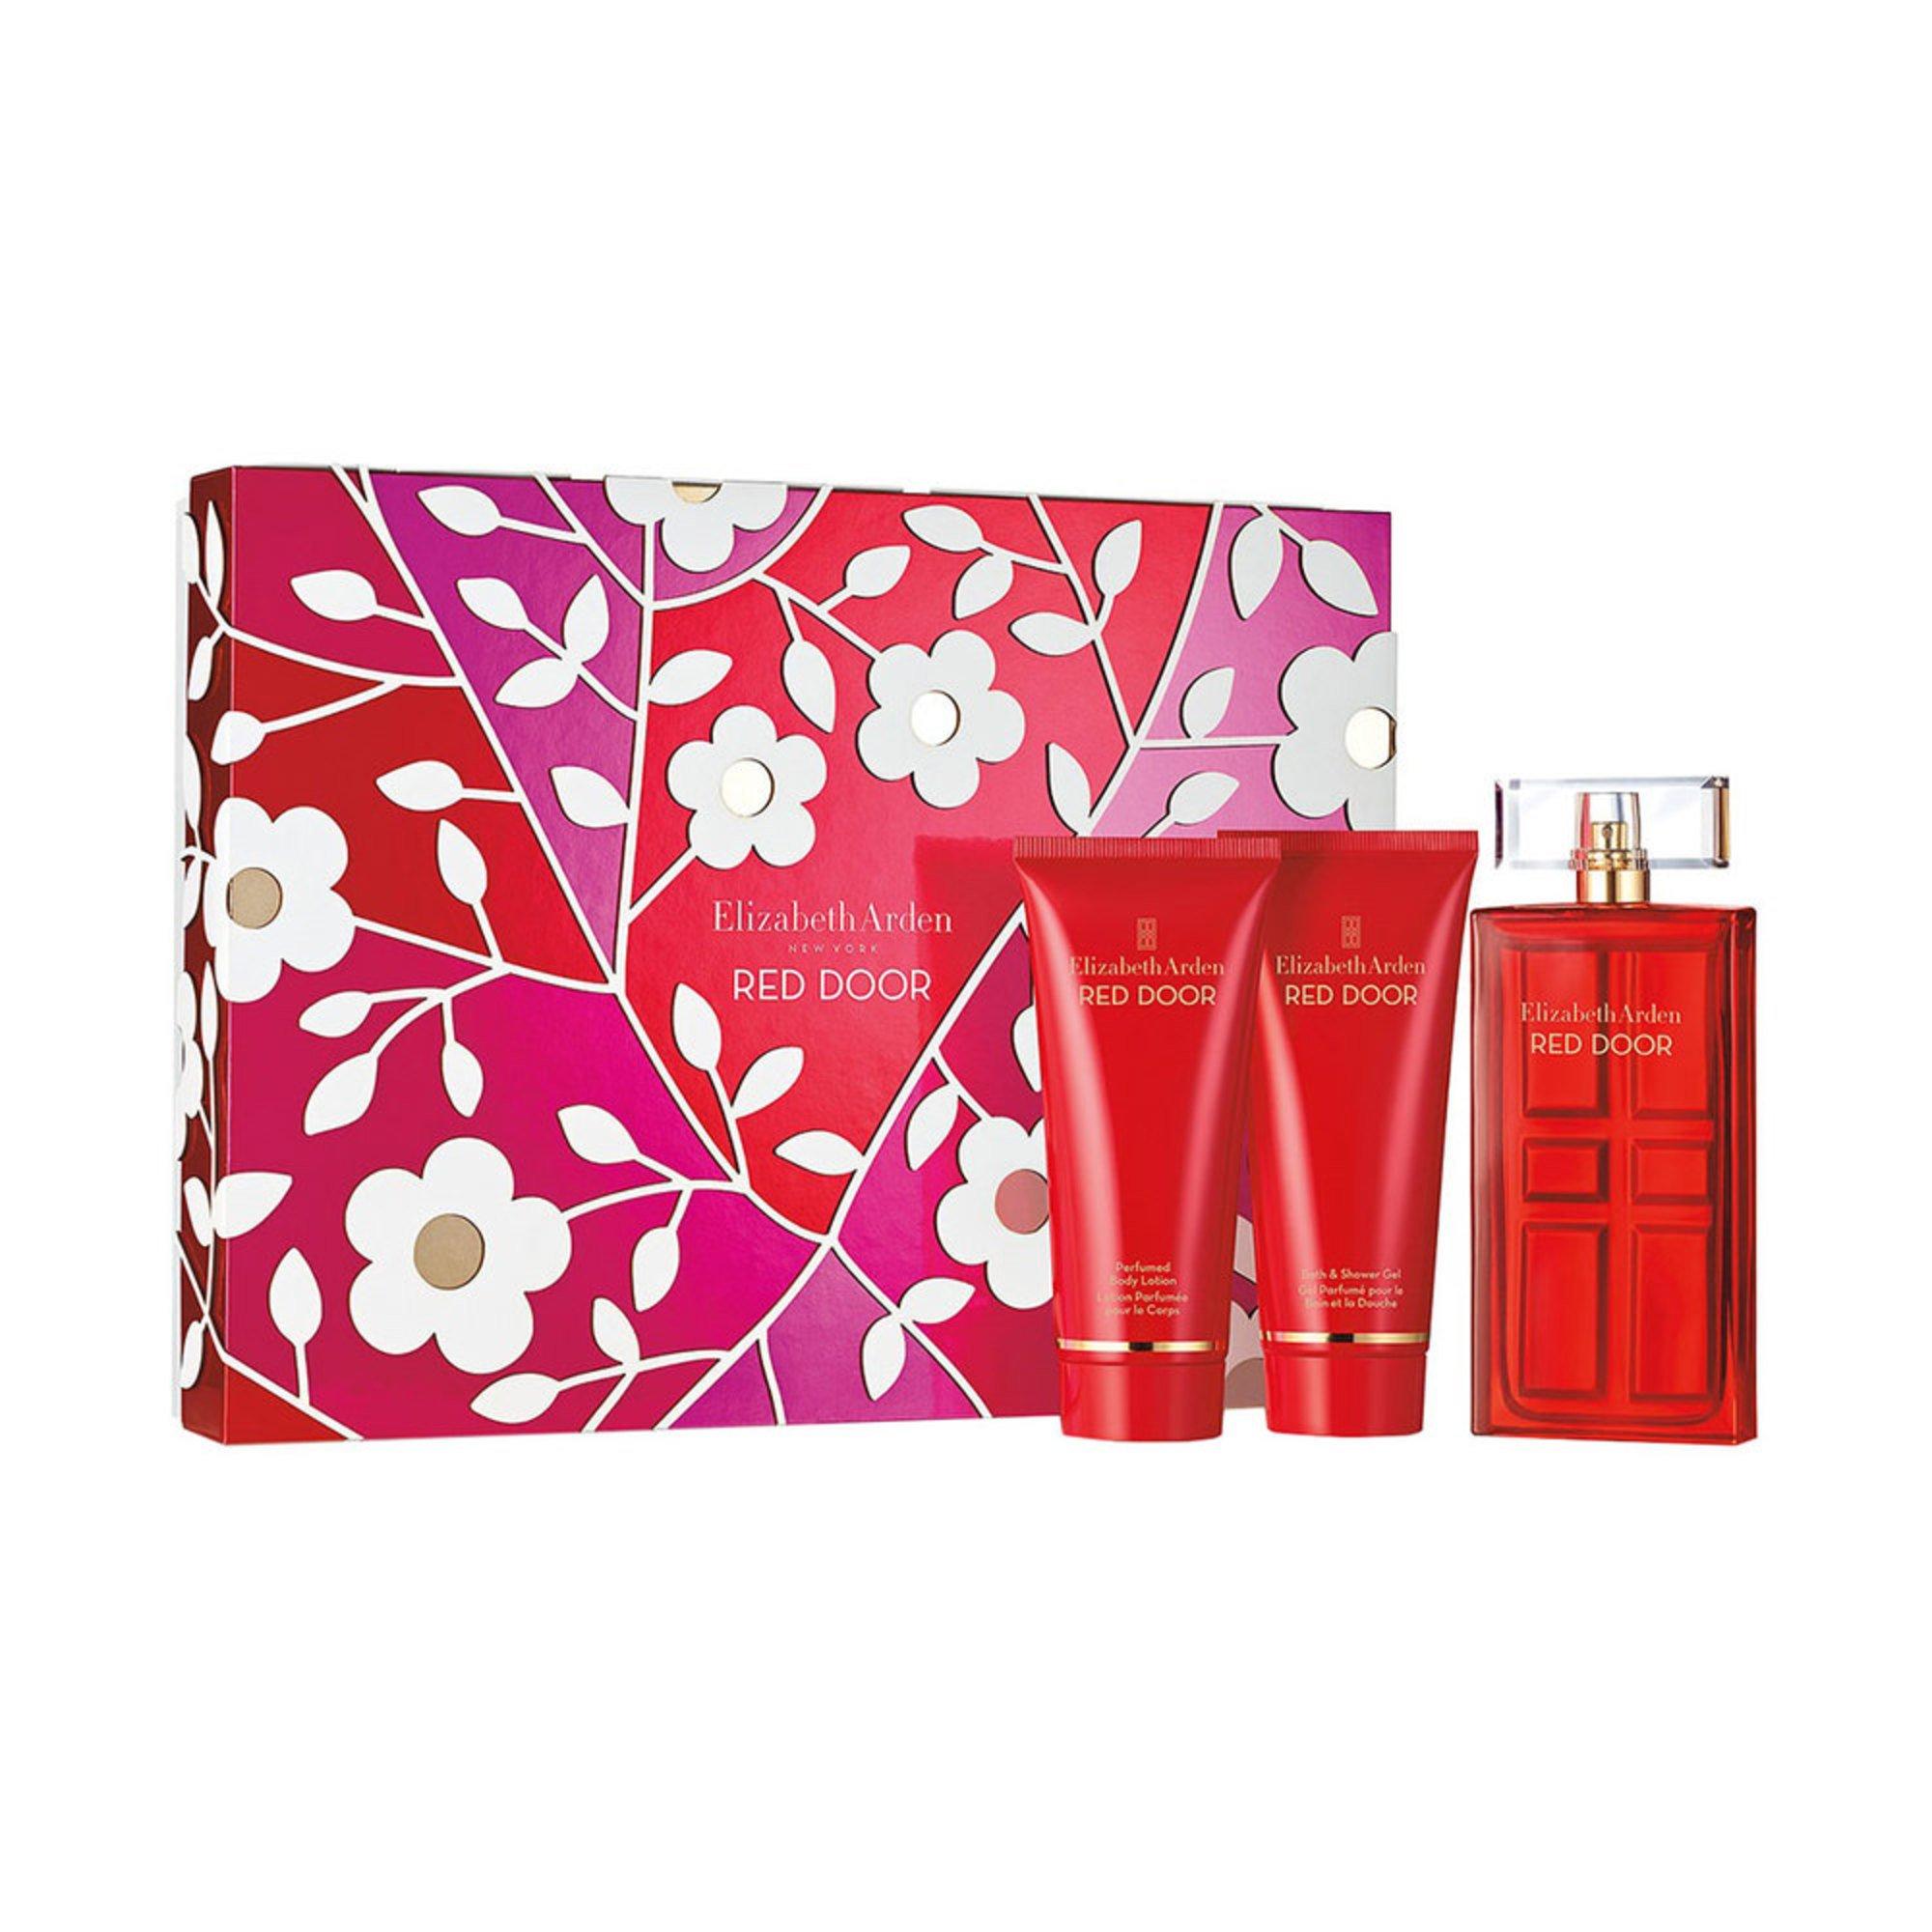 Elizabeth Arden Red Door 3 Piece Set Womens Fragrance Gift Sets